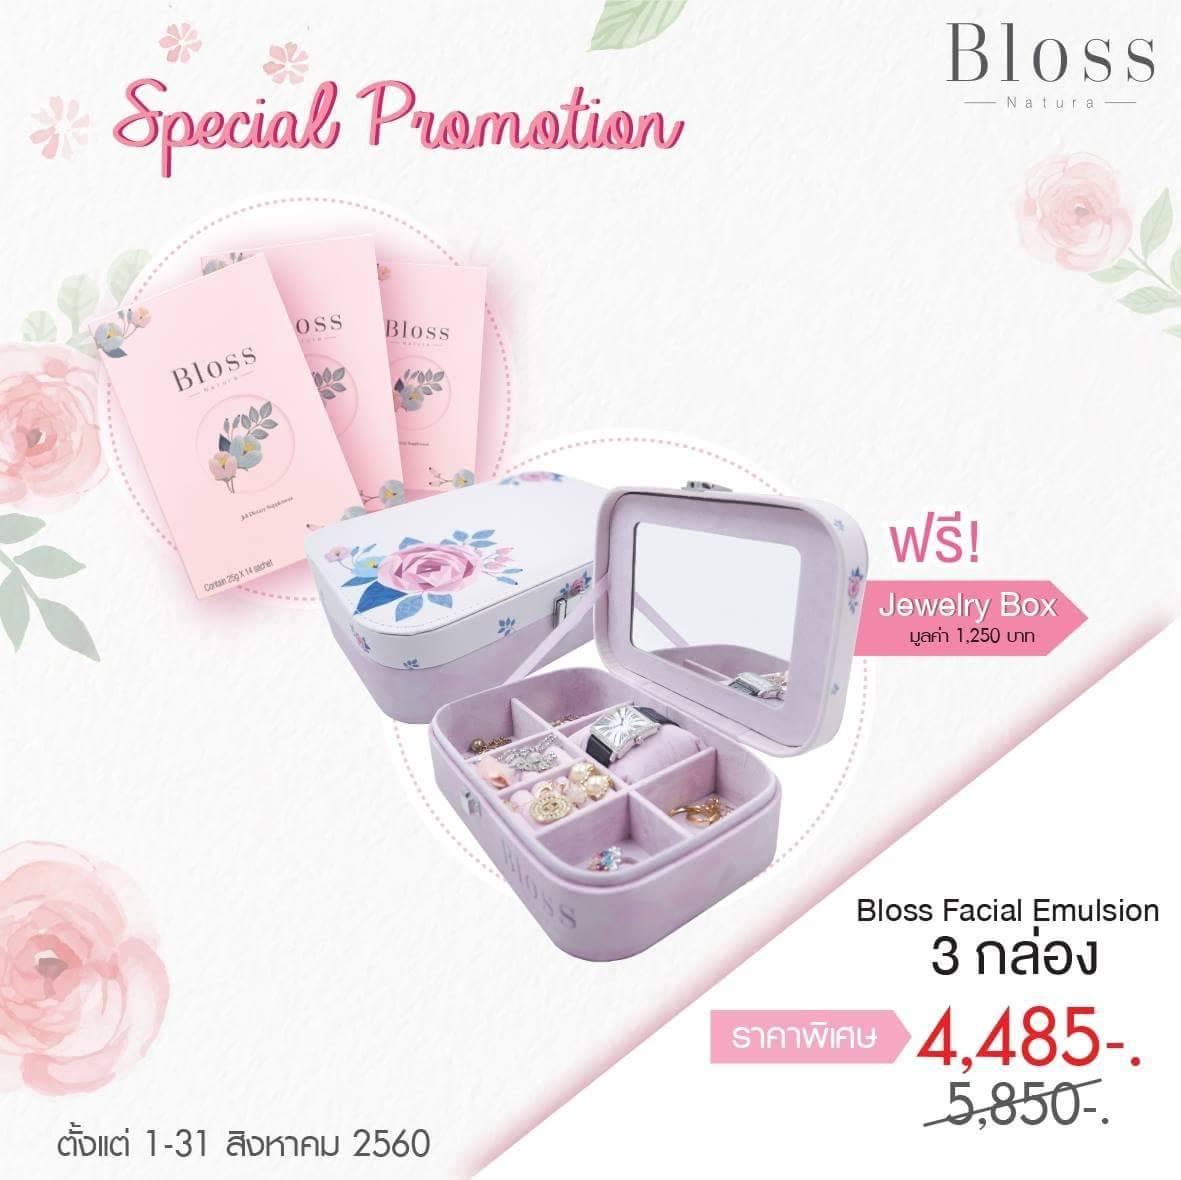 Bloss Jeli Booster 3 กล่อง แถมฟรี Jewerly Box มูลค่า 1,250 บาท